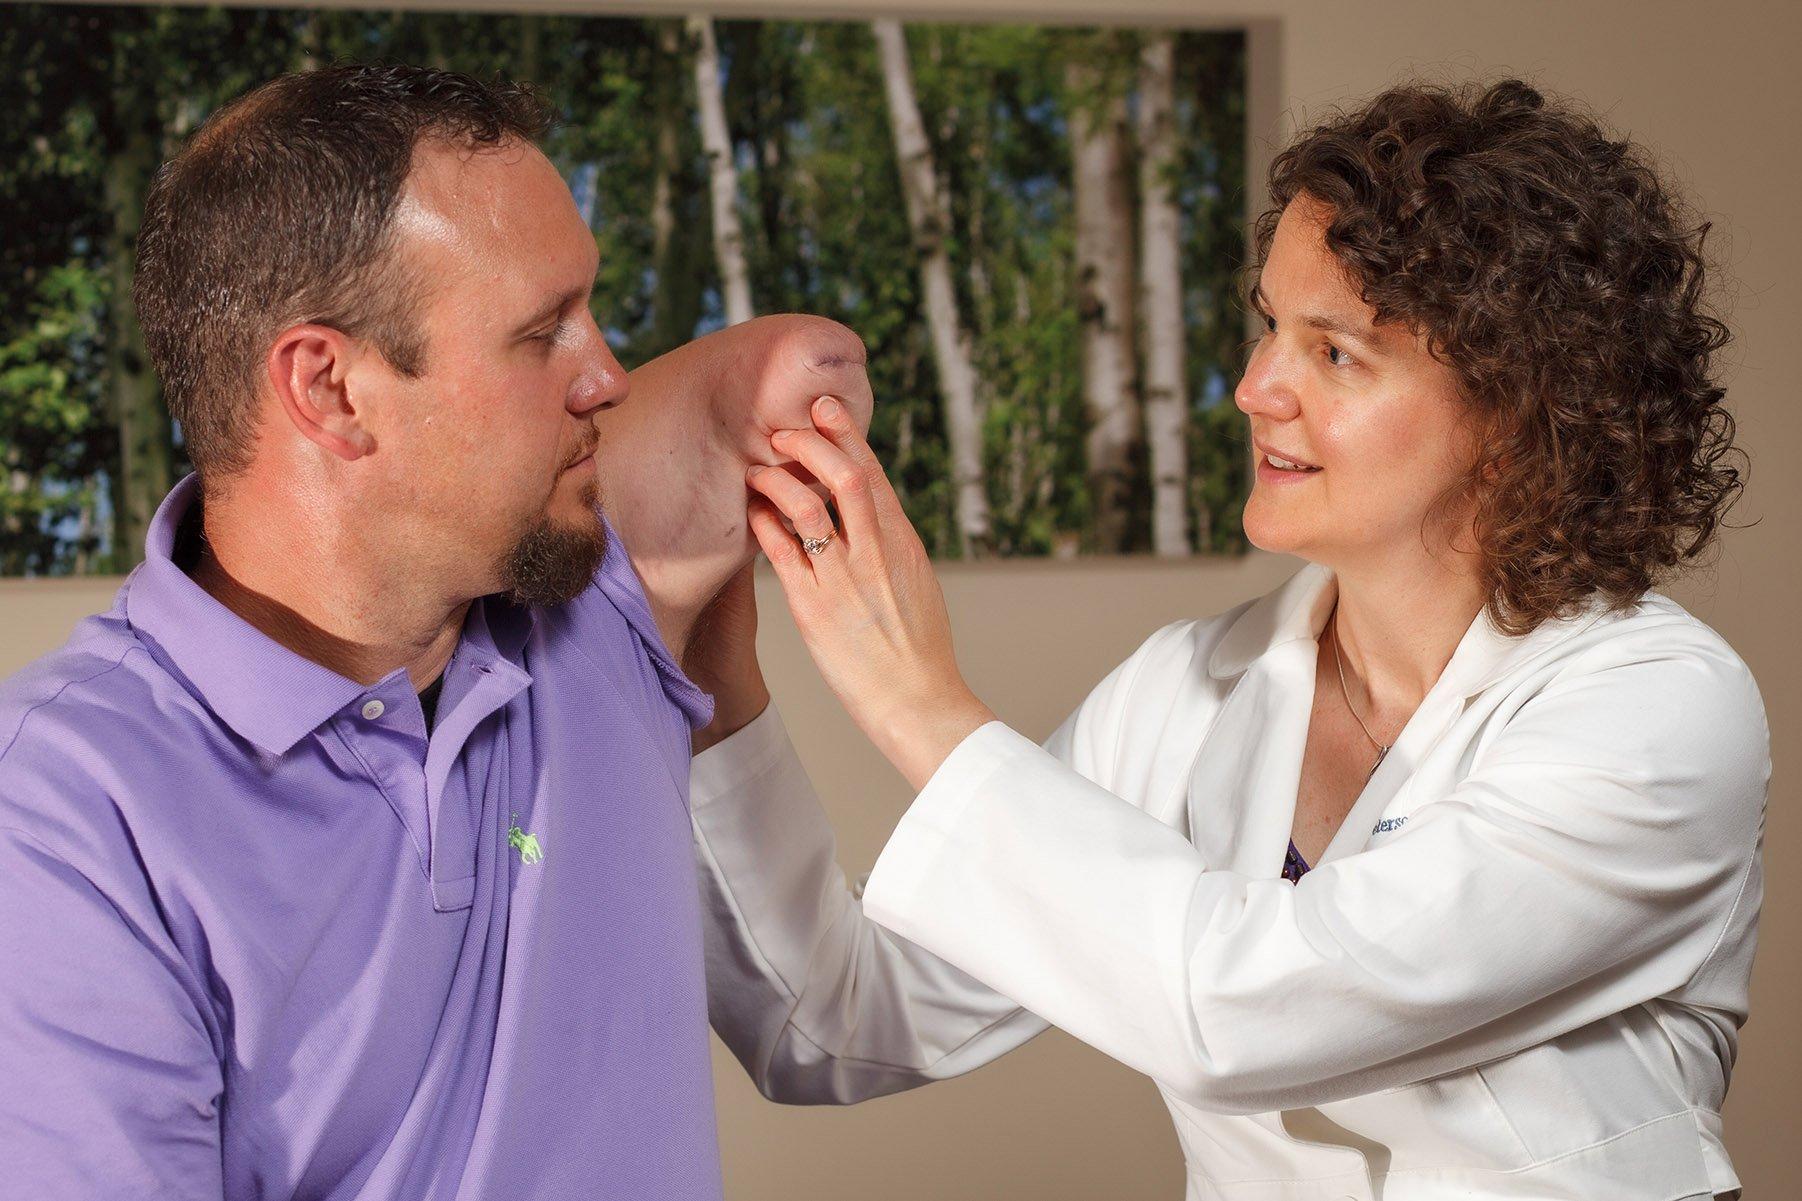 Jennifer Peterson Pre Prosthetic Therapy